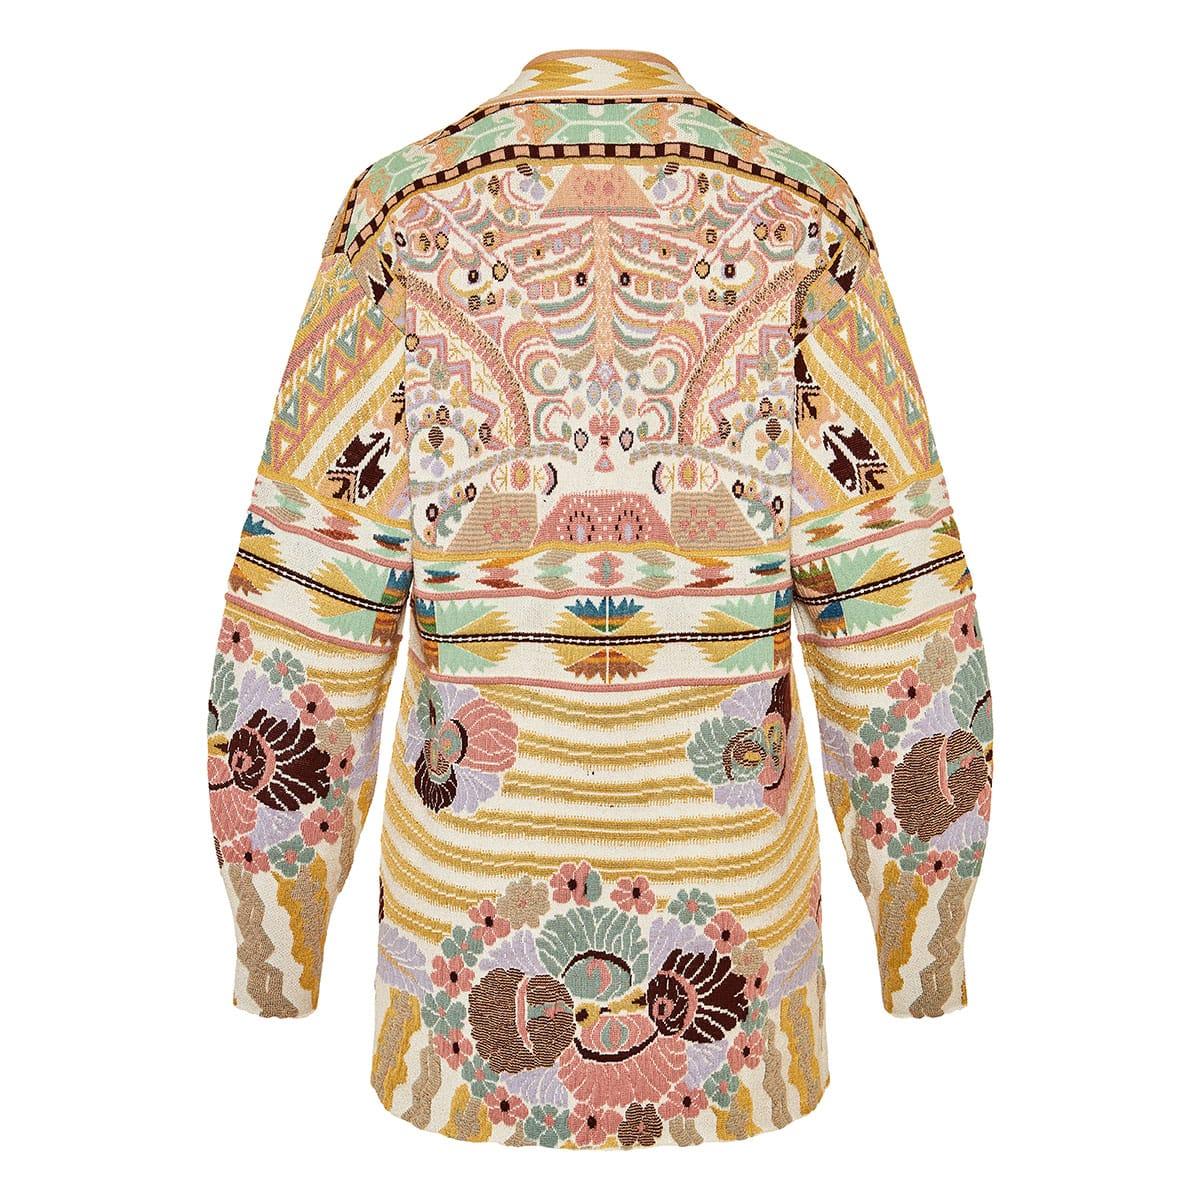 Oversized printed jacquard cardigan